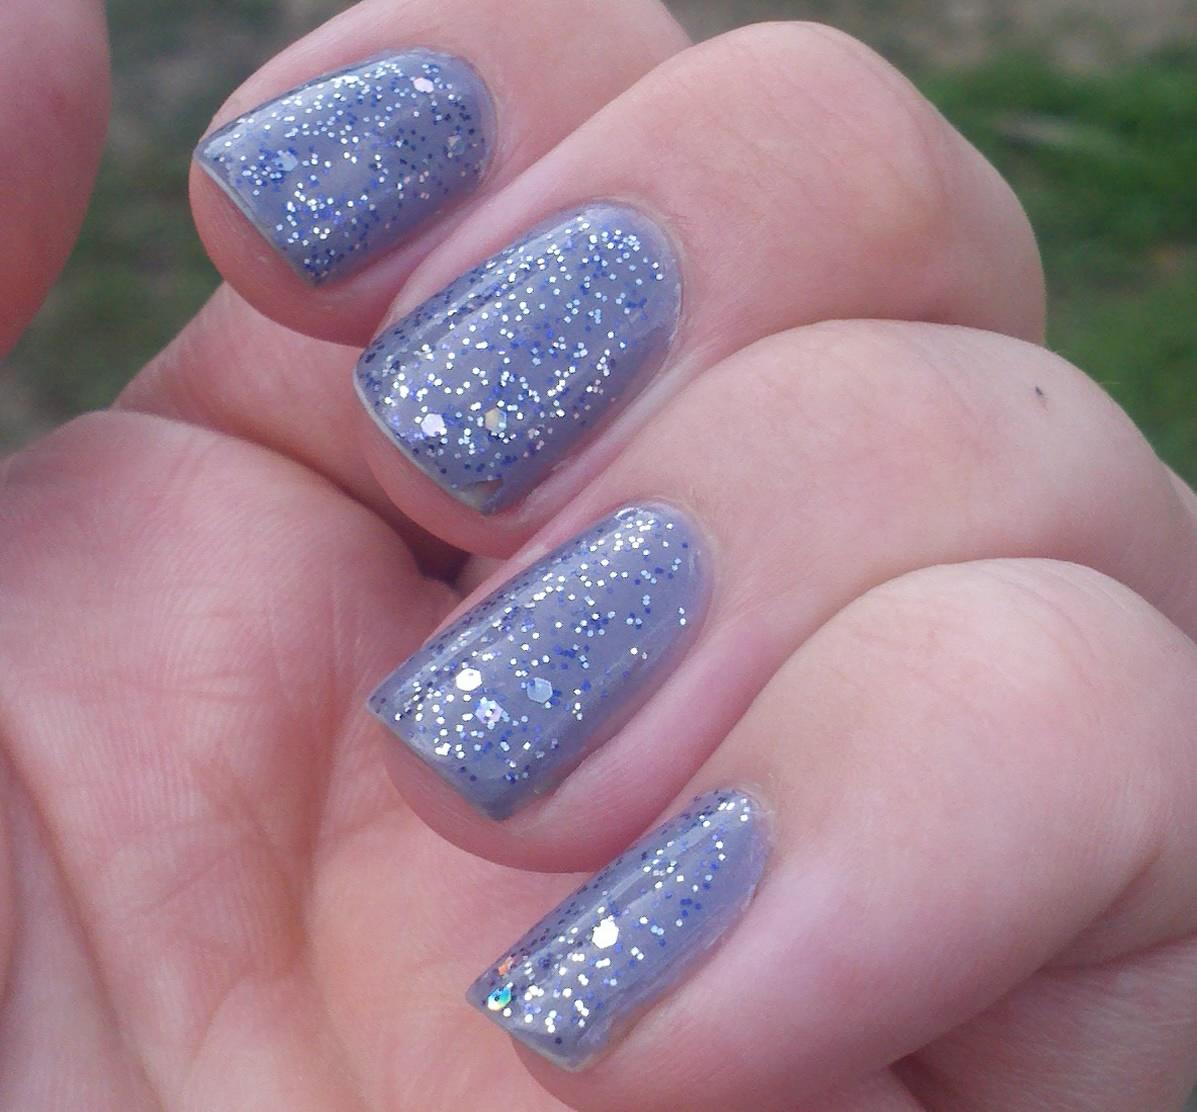 Kool Aid Nail Polish Stains: CherryGlamGirl: Cult Nails My Kind Of Kool Aid W/ Revlon